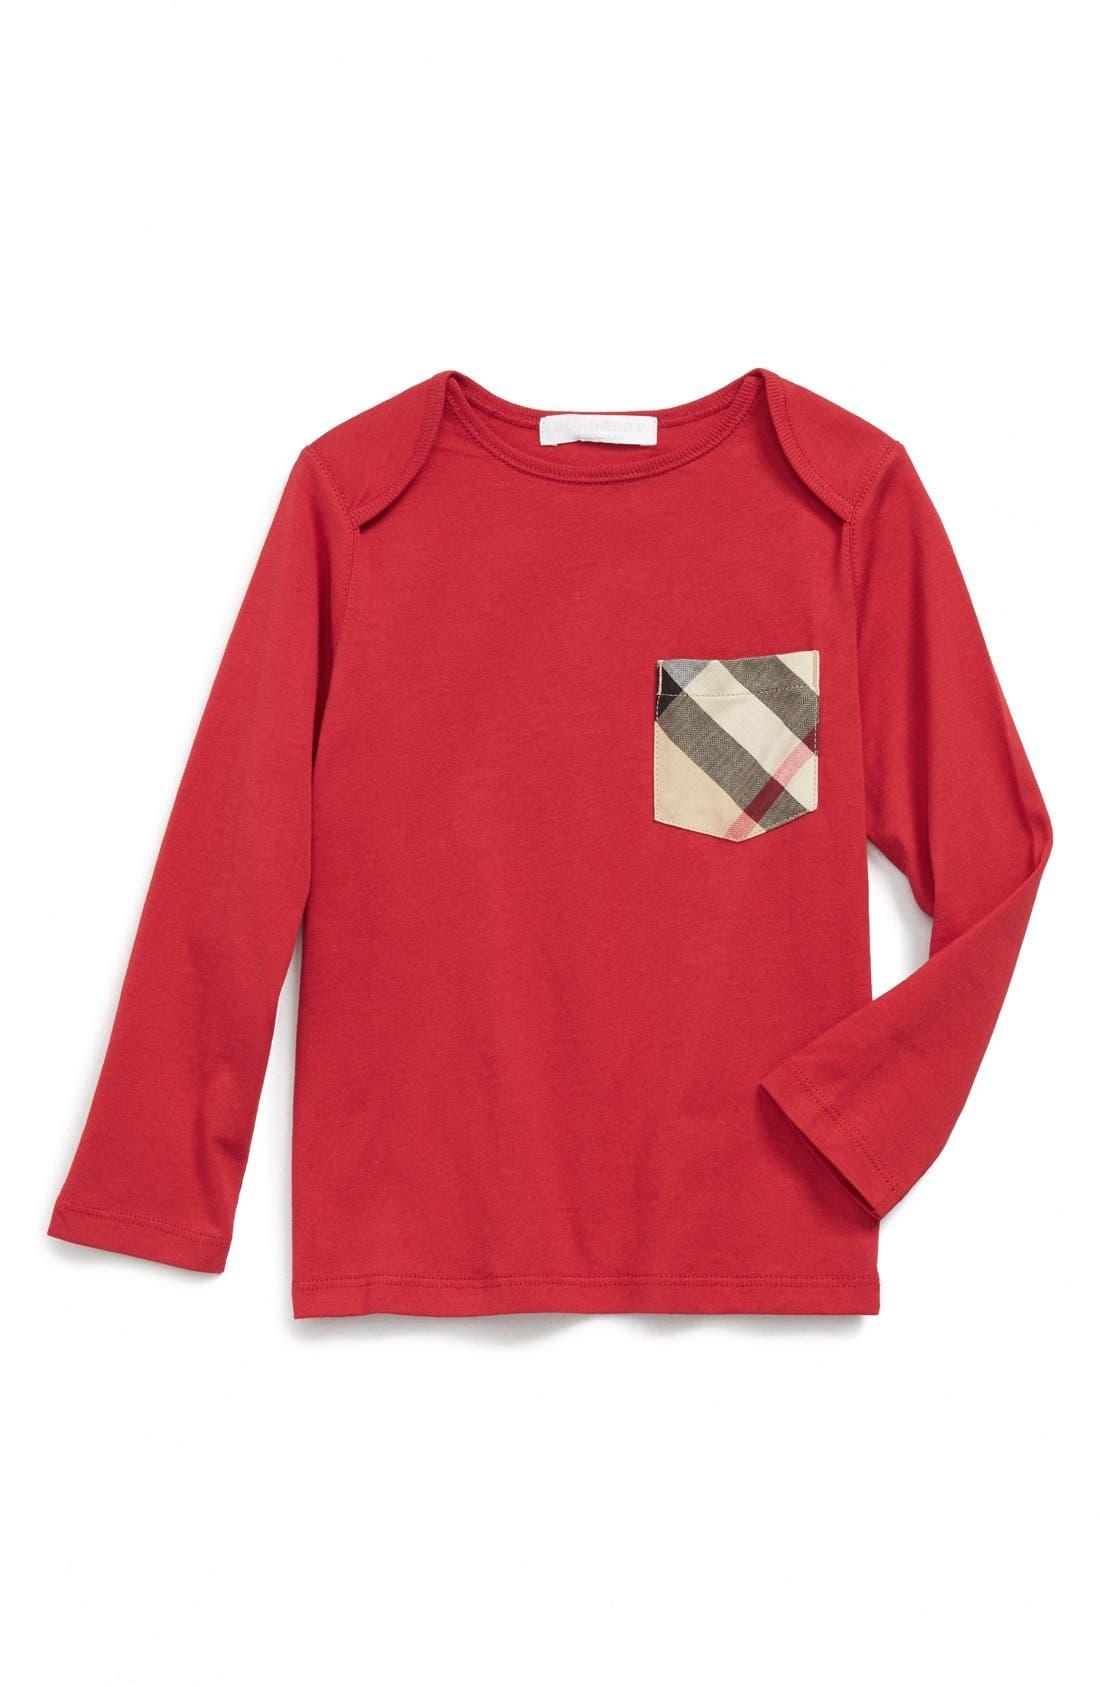 'Callum' Check Print Chest Pocket T-Shirt,                             Main thumbnail 1, color,                             Military Red